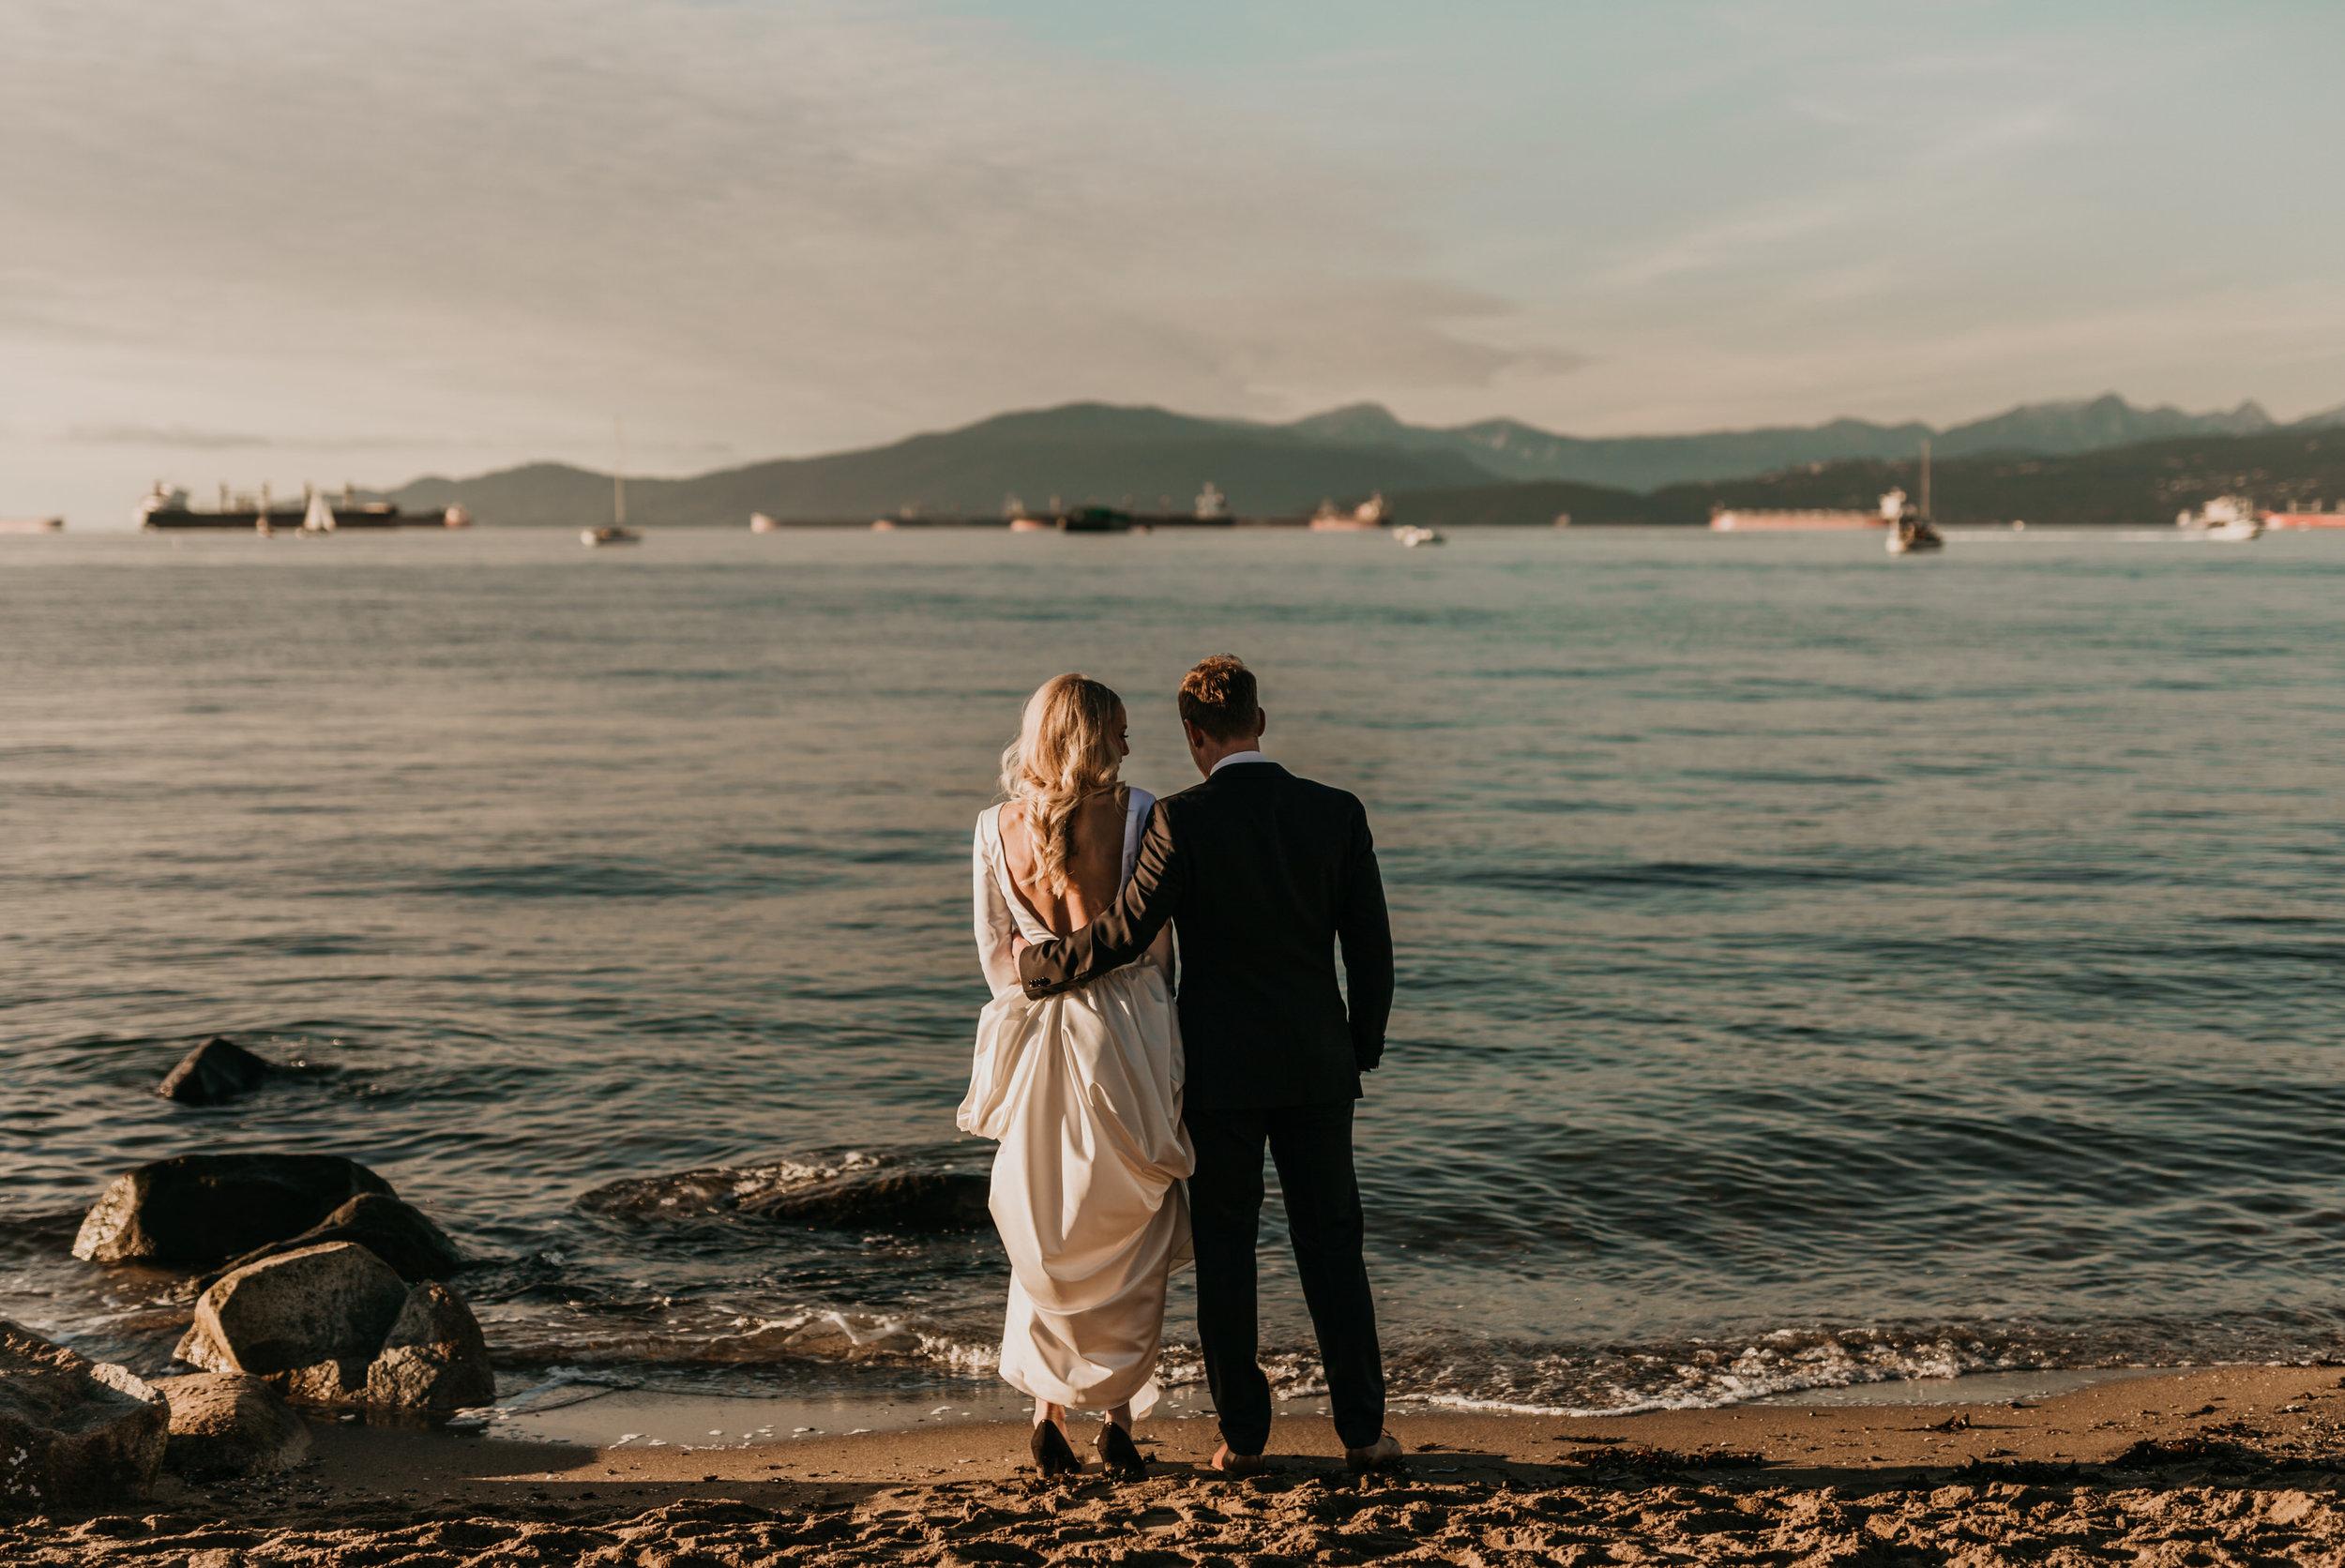 Vancouver Wedding Photos - Vegan Wedding Photographer - New Years Eve Wedding Photos - Vancouver Wedding Photographer - Vancouver Wedding Videographer - 649.JPG